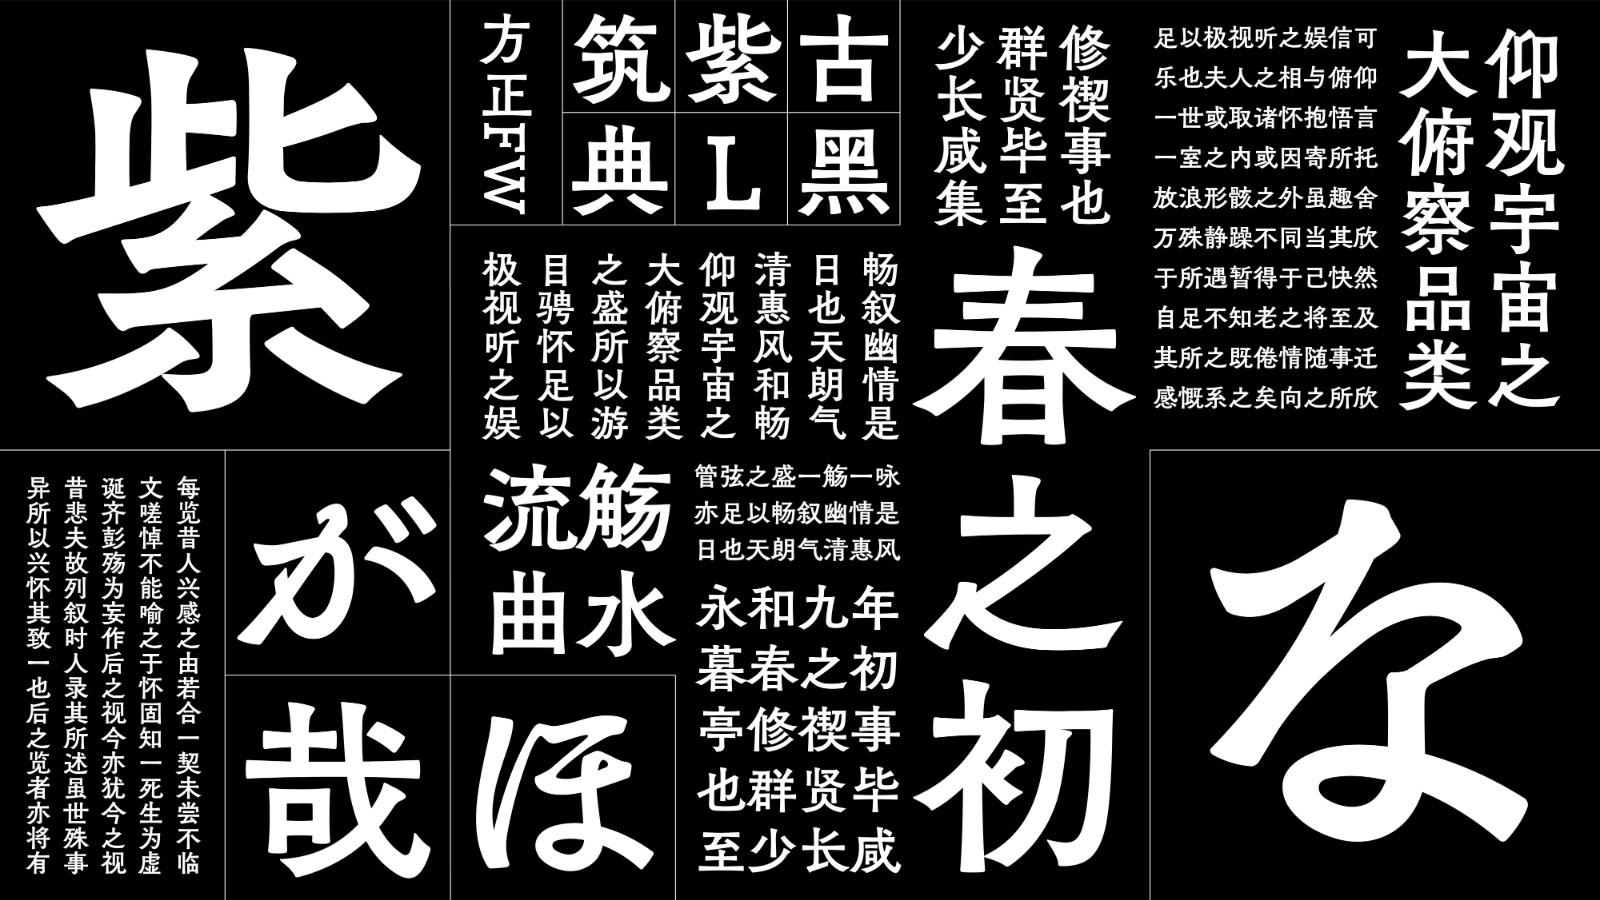 https://ft-bk1.oss-cn-zhangjiakou.aliyuncs.com/Public/Uploads/img/n_content_20201210175727_8927.jpg